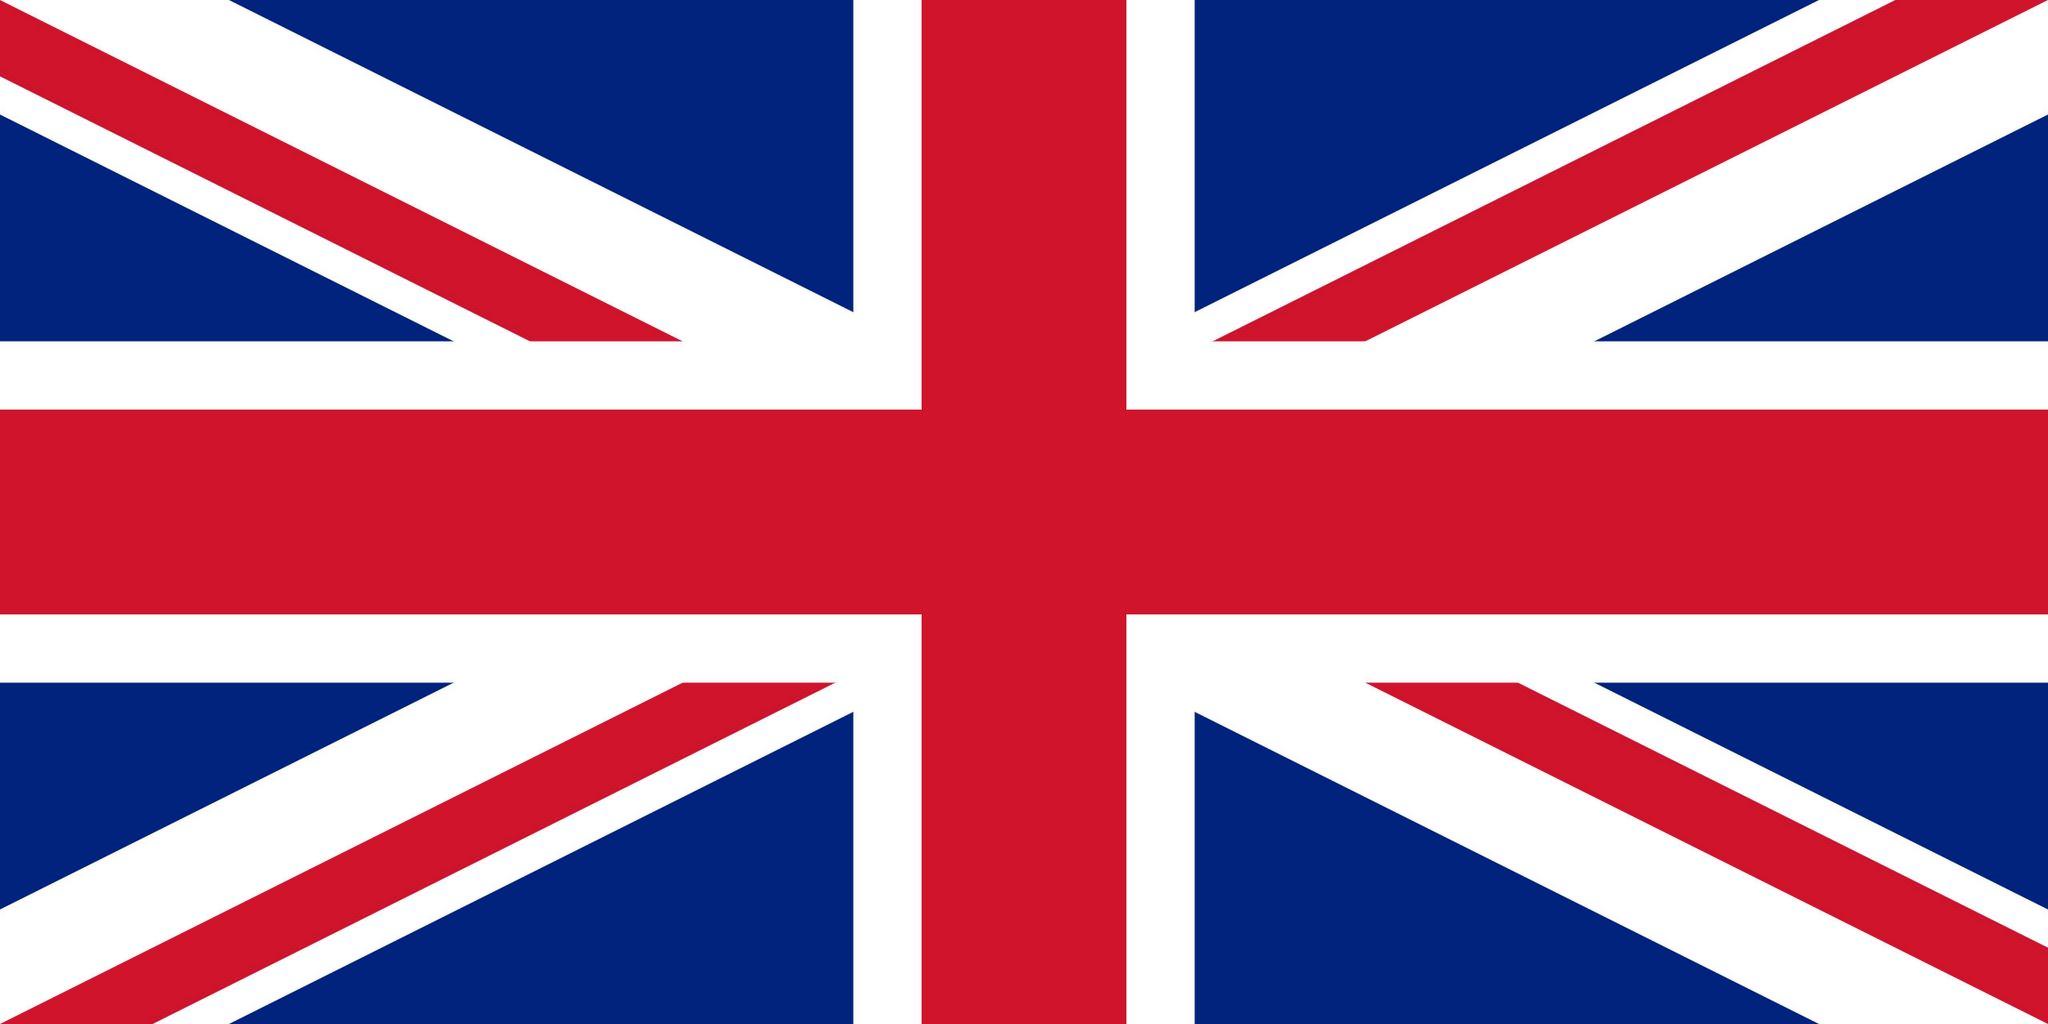 Meilleur De Image Angleterre Gratuite Imprimer